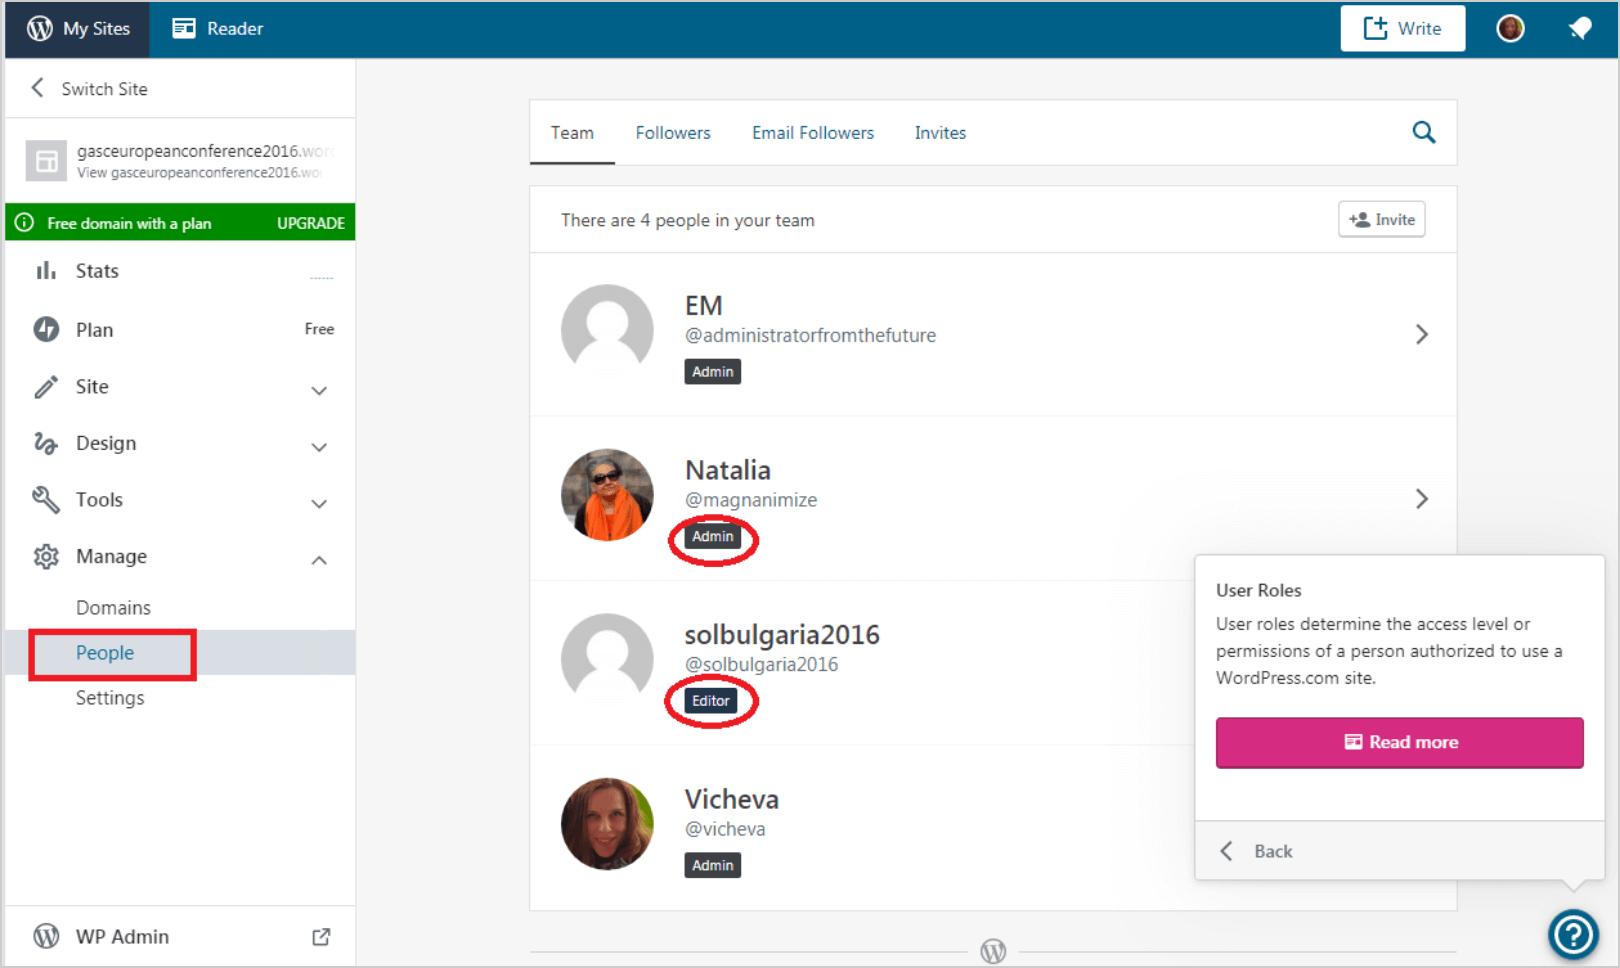 Managing user roles on WordPress.com admin